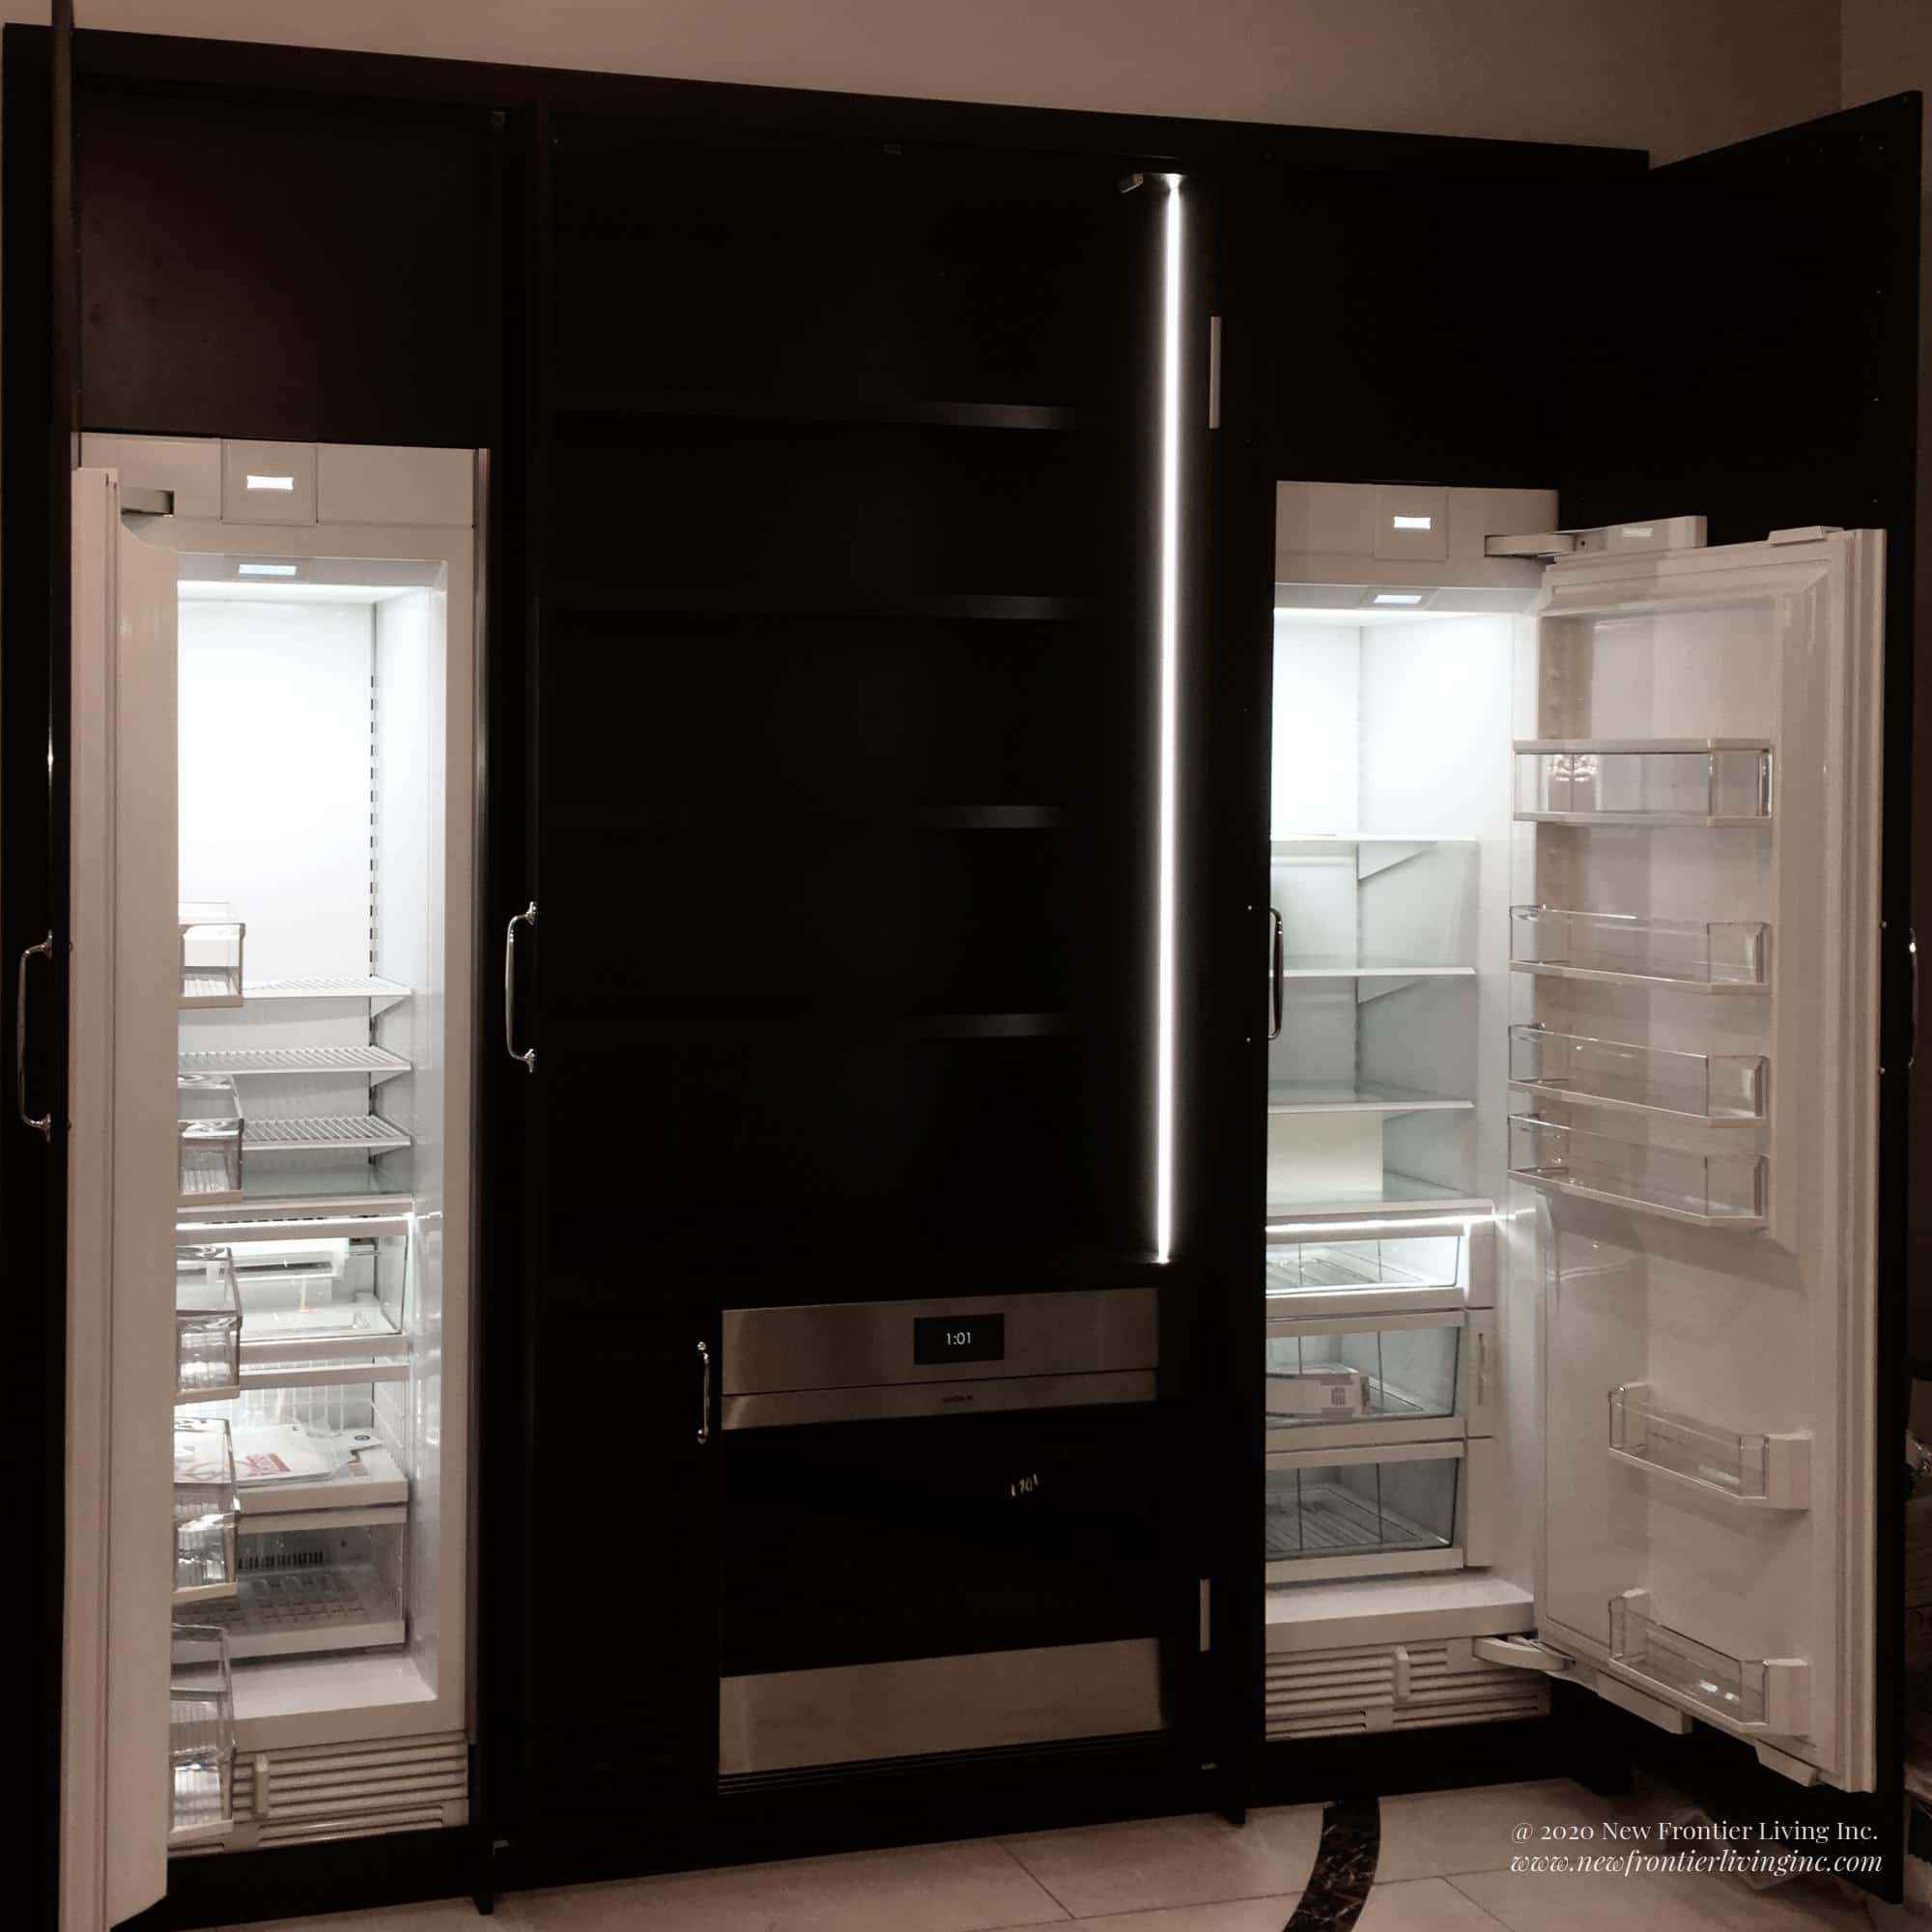 Black kitchen cabinet panelling for fridge and freezer